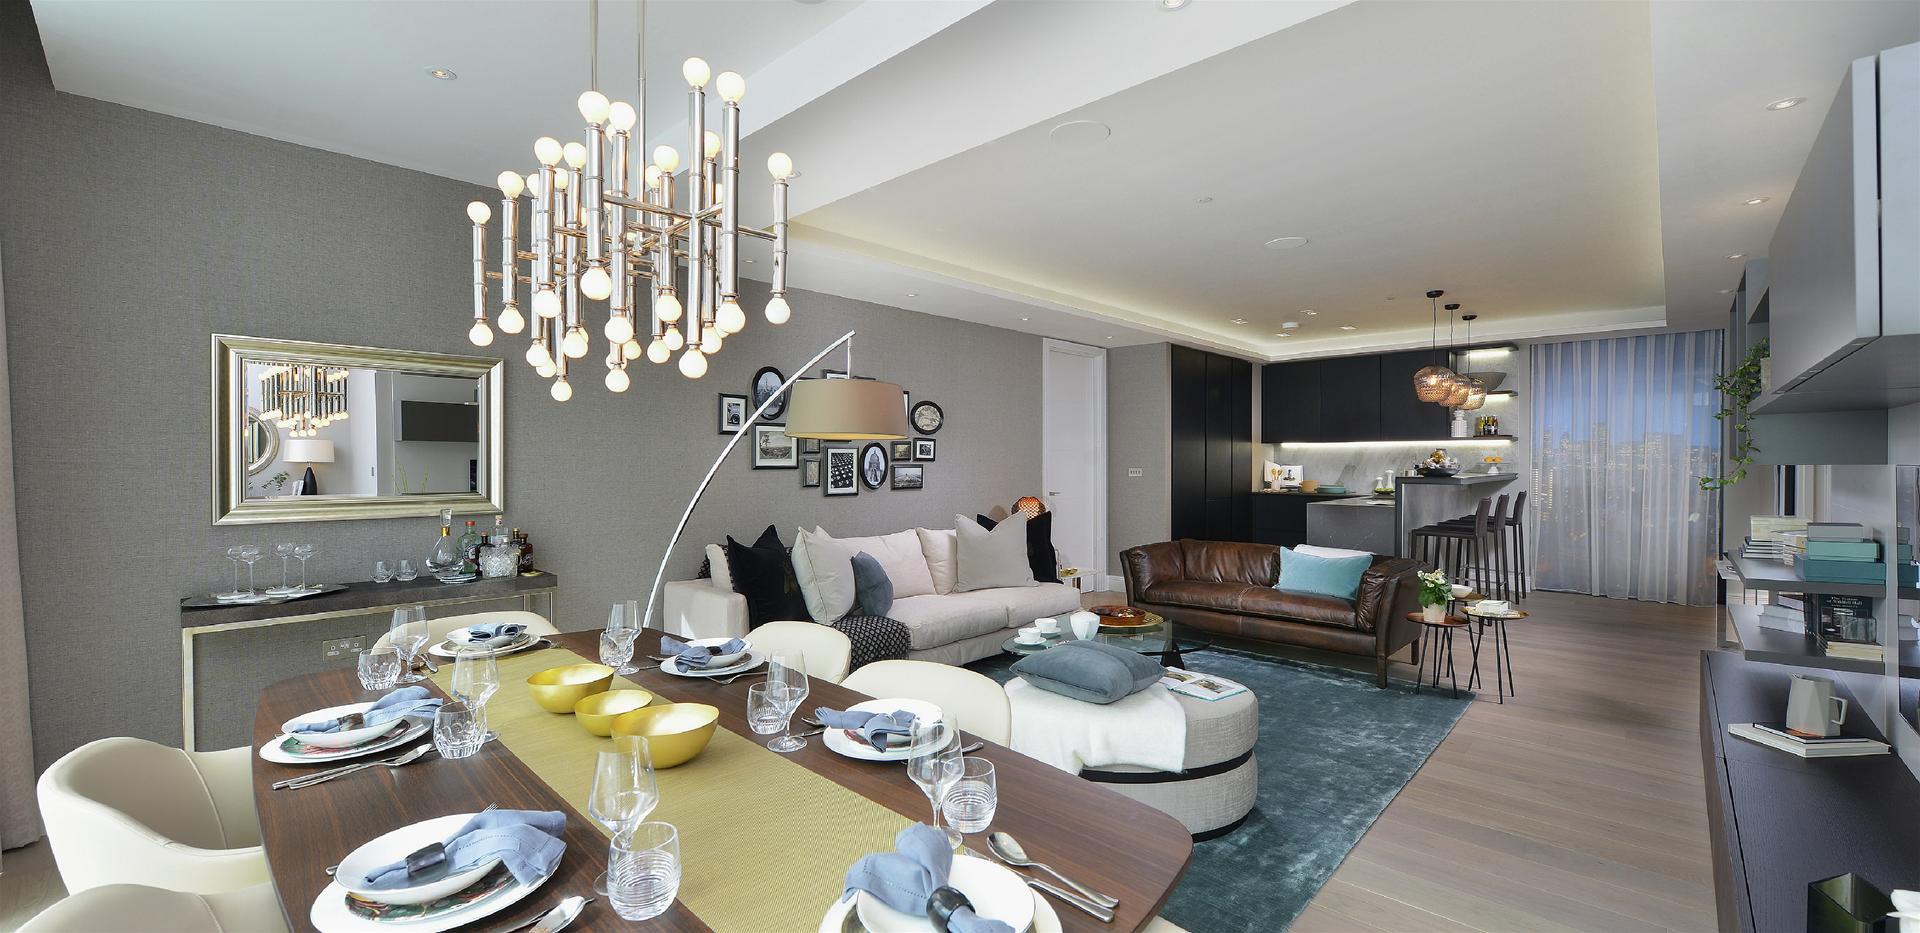 Berkeley, 250 City Road, Islington, Show Apartment, Living Room, Interior